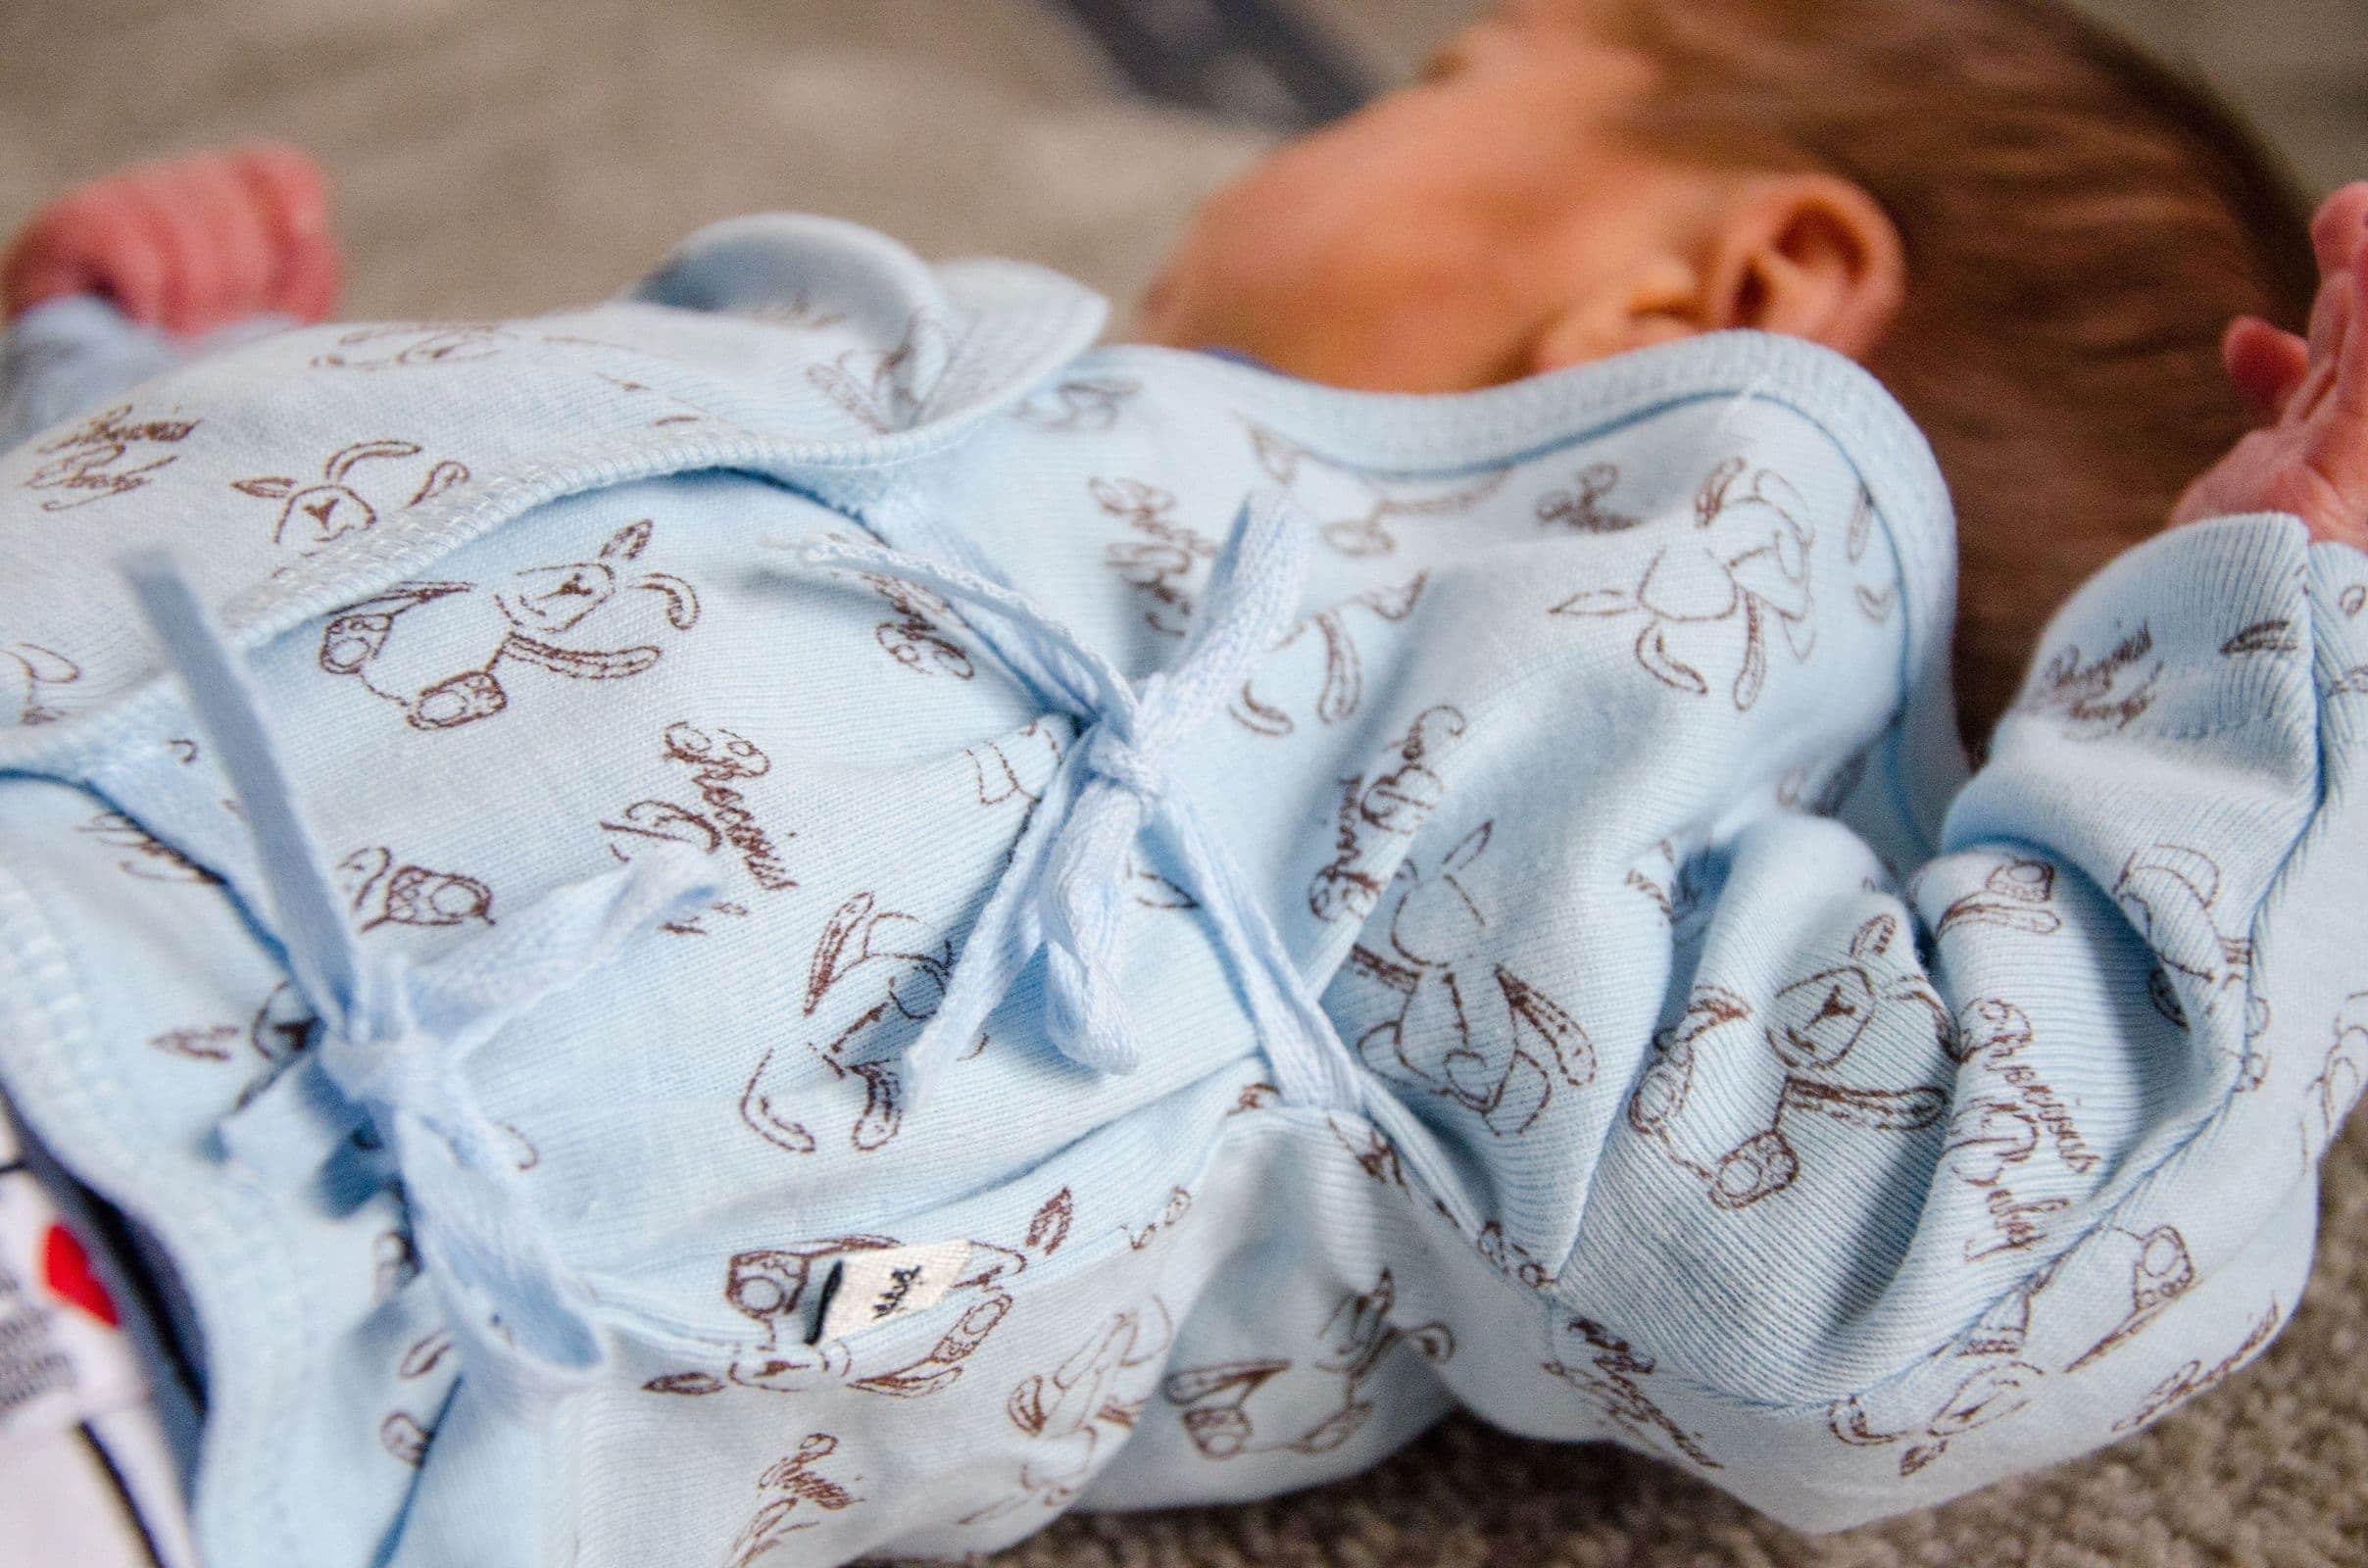 bunte frÜhchenmode: tom trÄgt gr. 44! - kinderkleidung